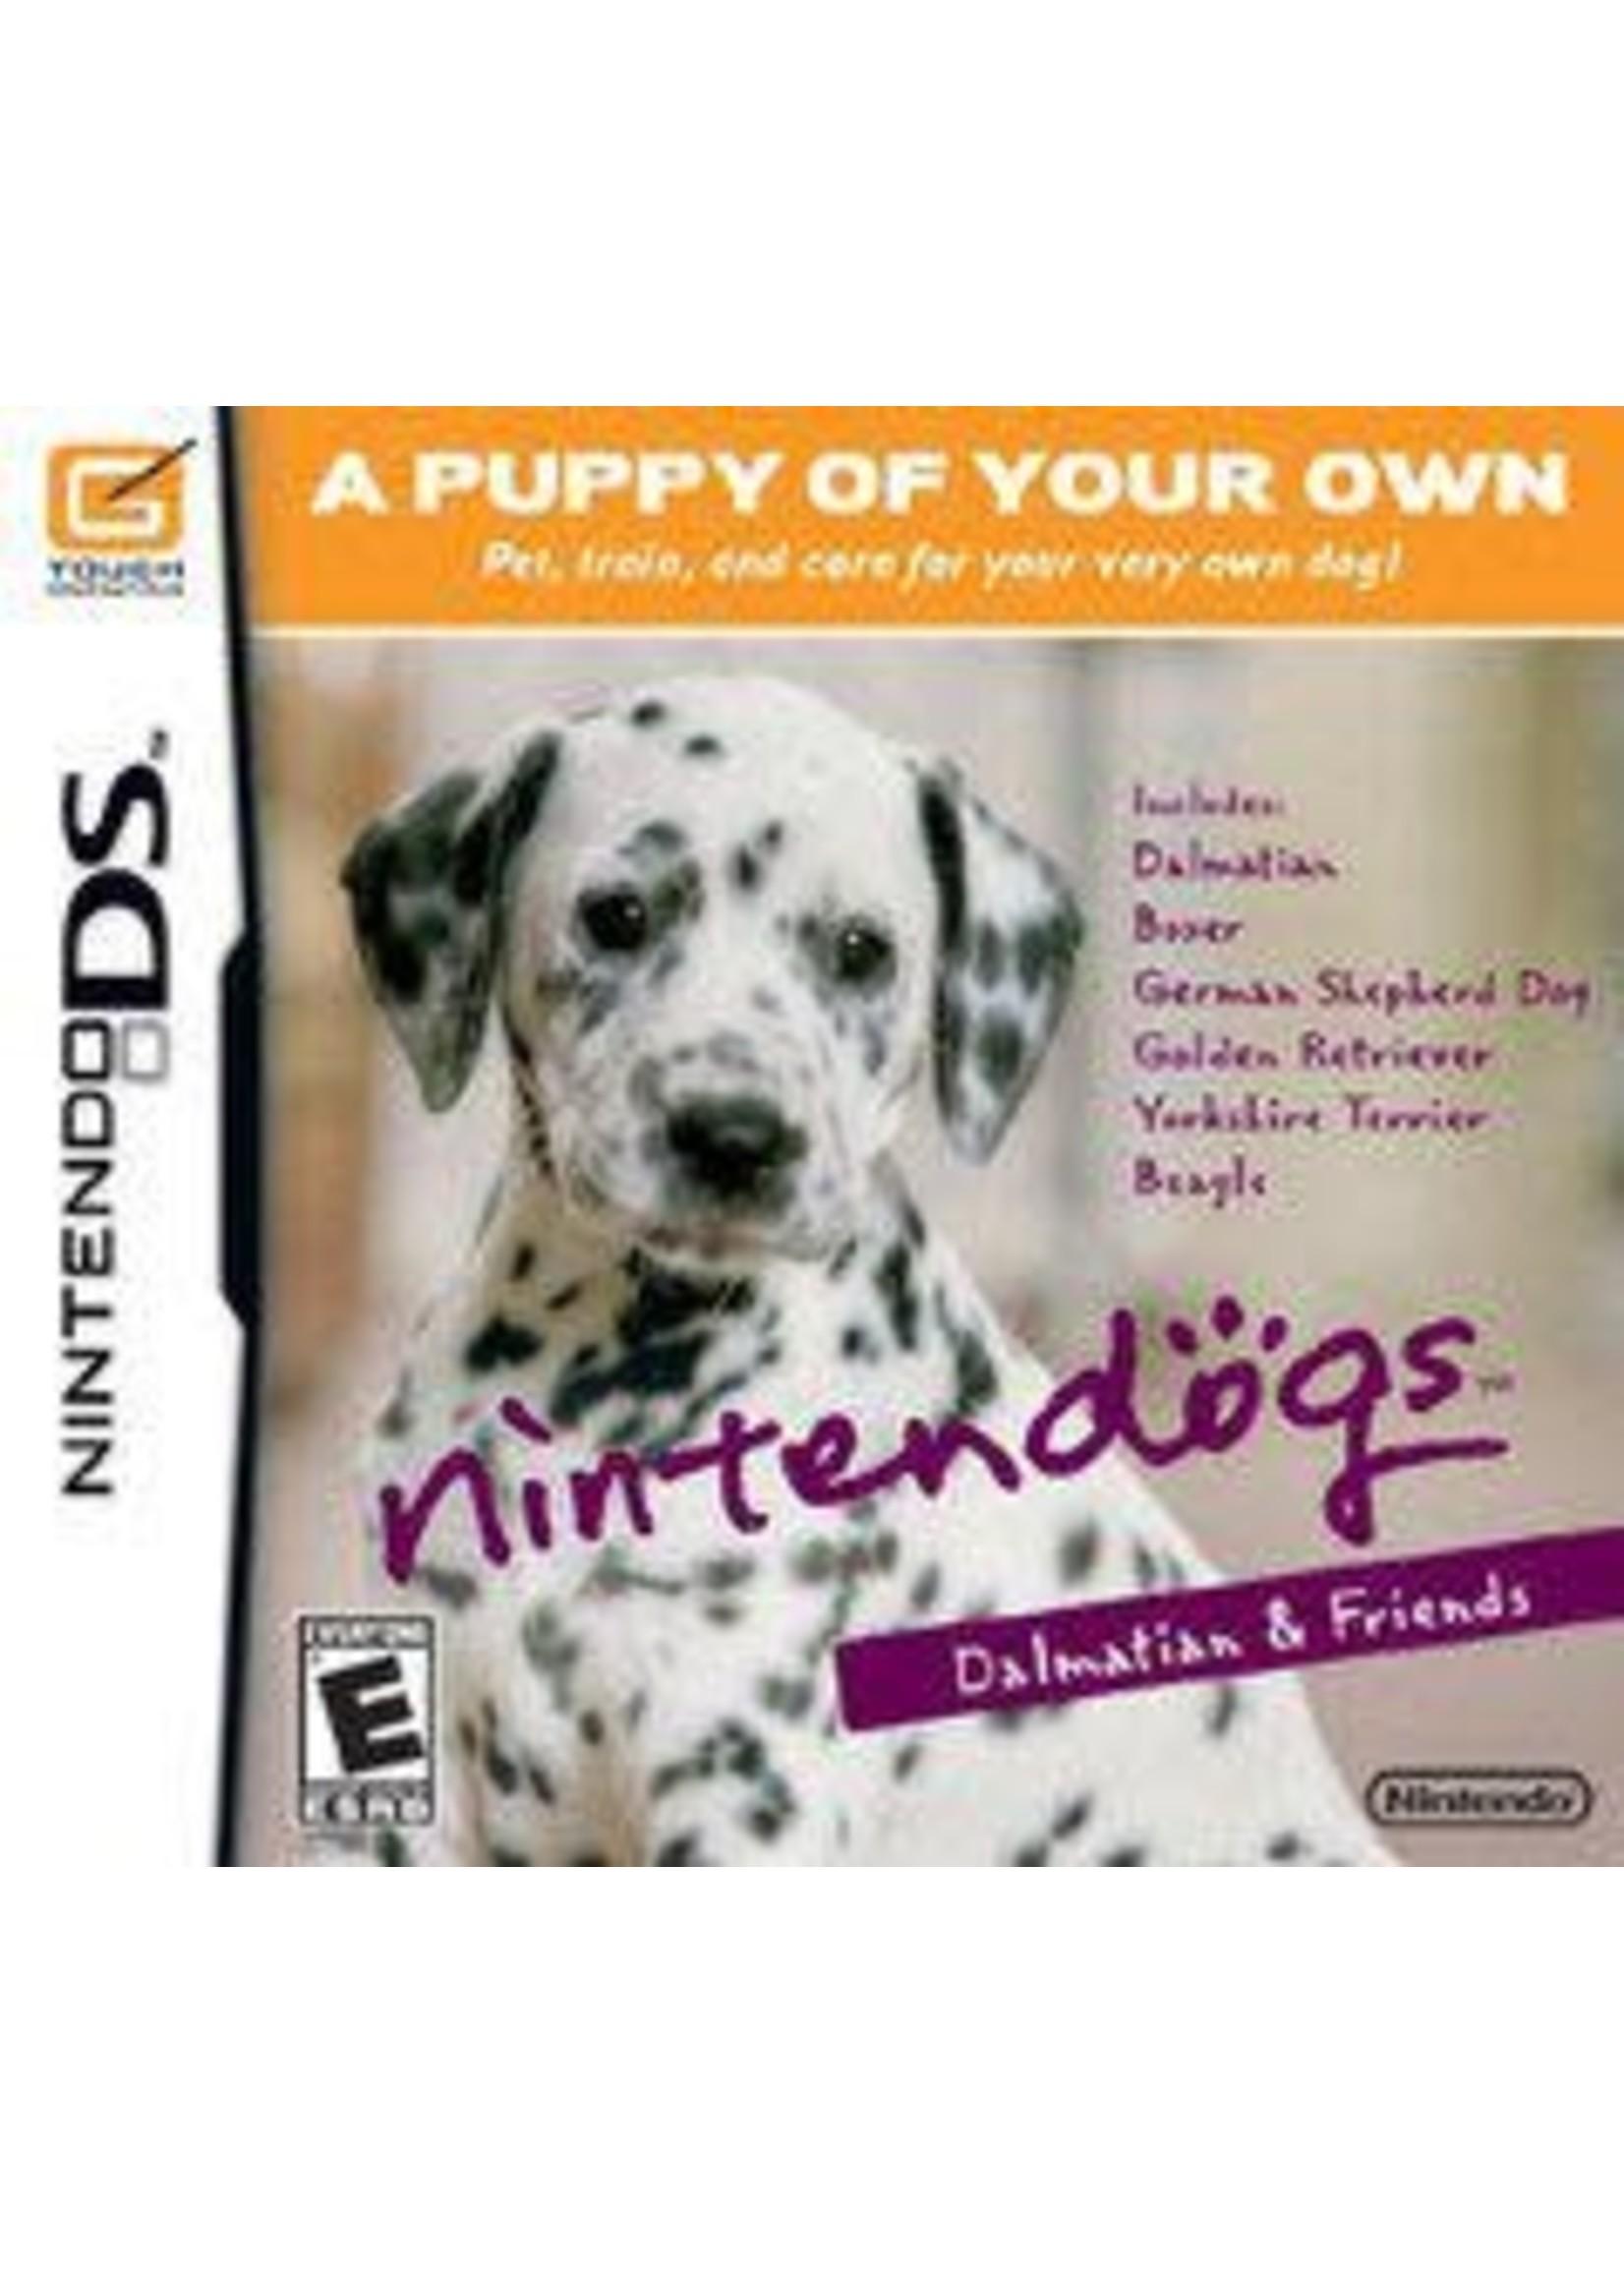 Nintendogs Dalmatian And Friends Nintendo DS